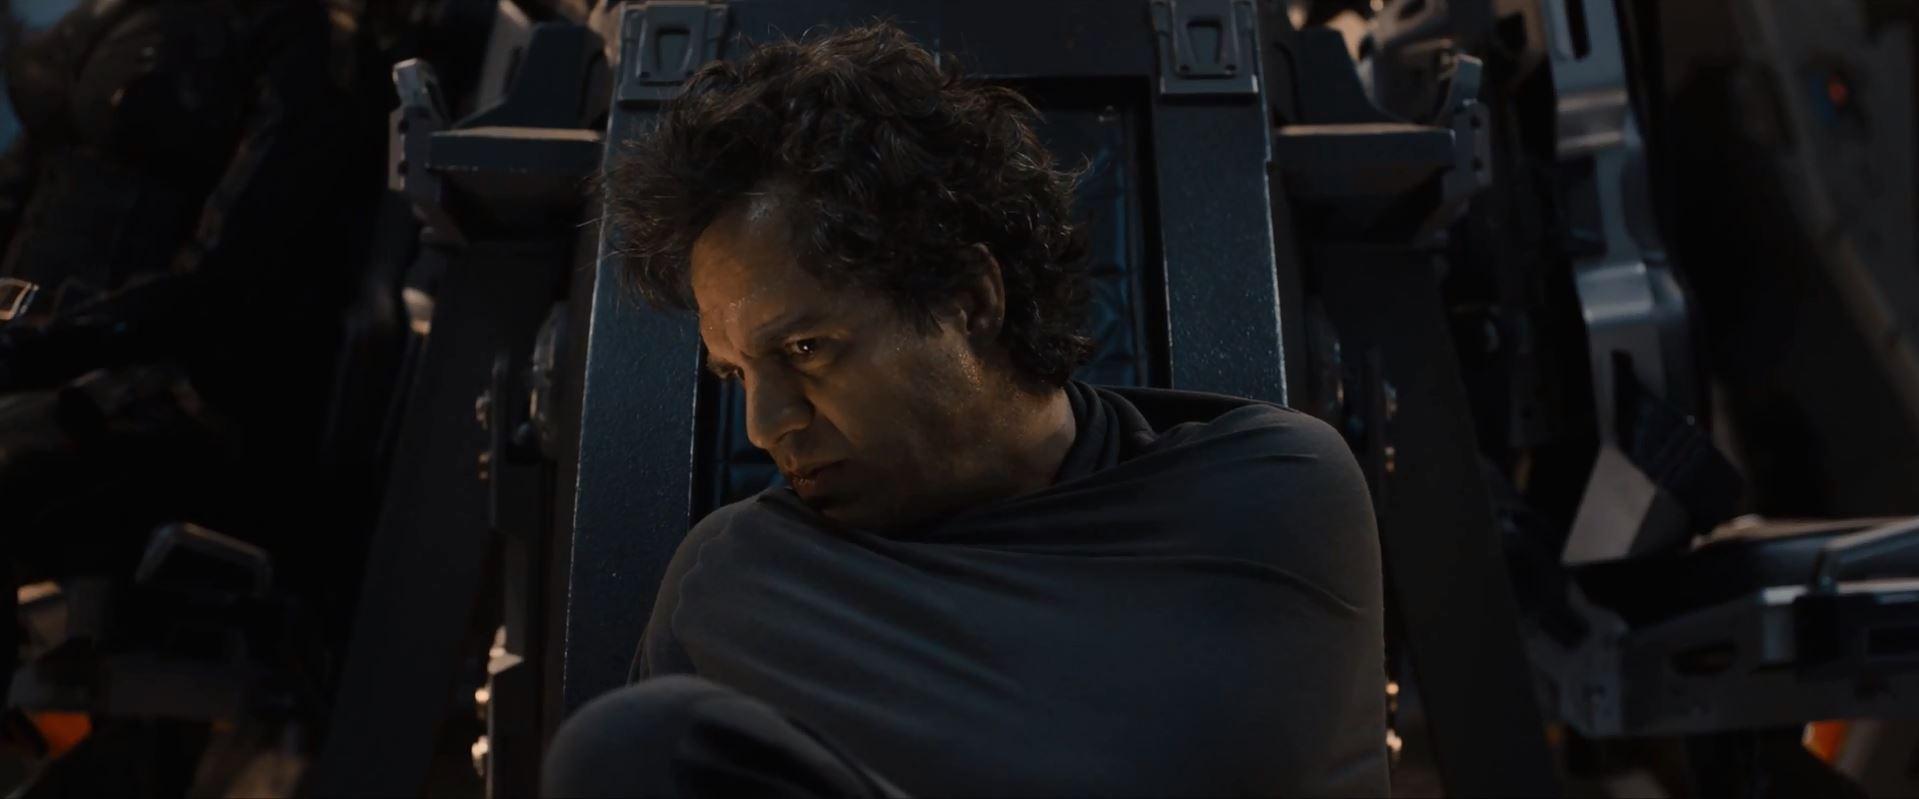 Avengers Age Of Ultron Trailer Released - Mark Ruffalo as Dr. Bruce Banner The Hulk